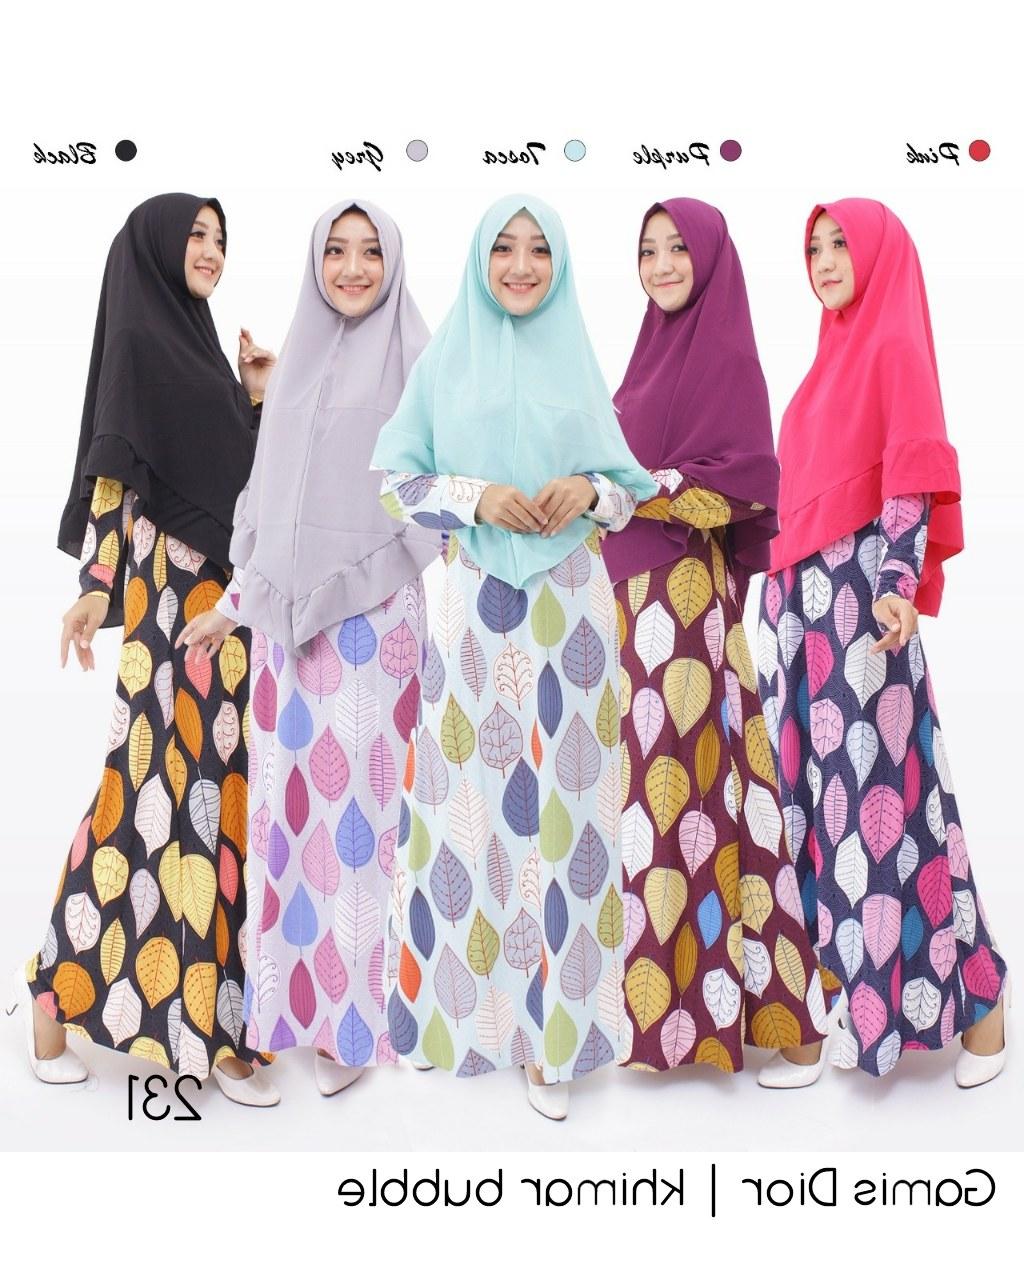 Inspirasi Baju Lebaran Syari 2018 X8d1 Jual Baju Gamis Syari Bahan Dior G231 Cipulir Edisi Maret